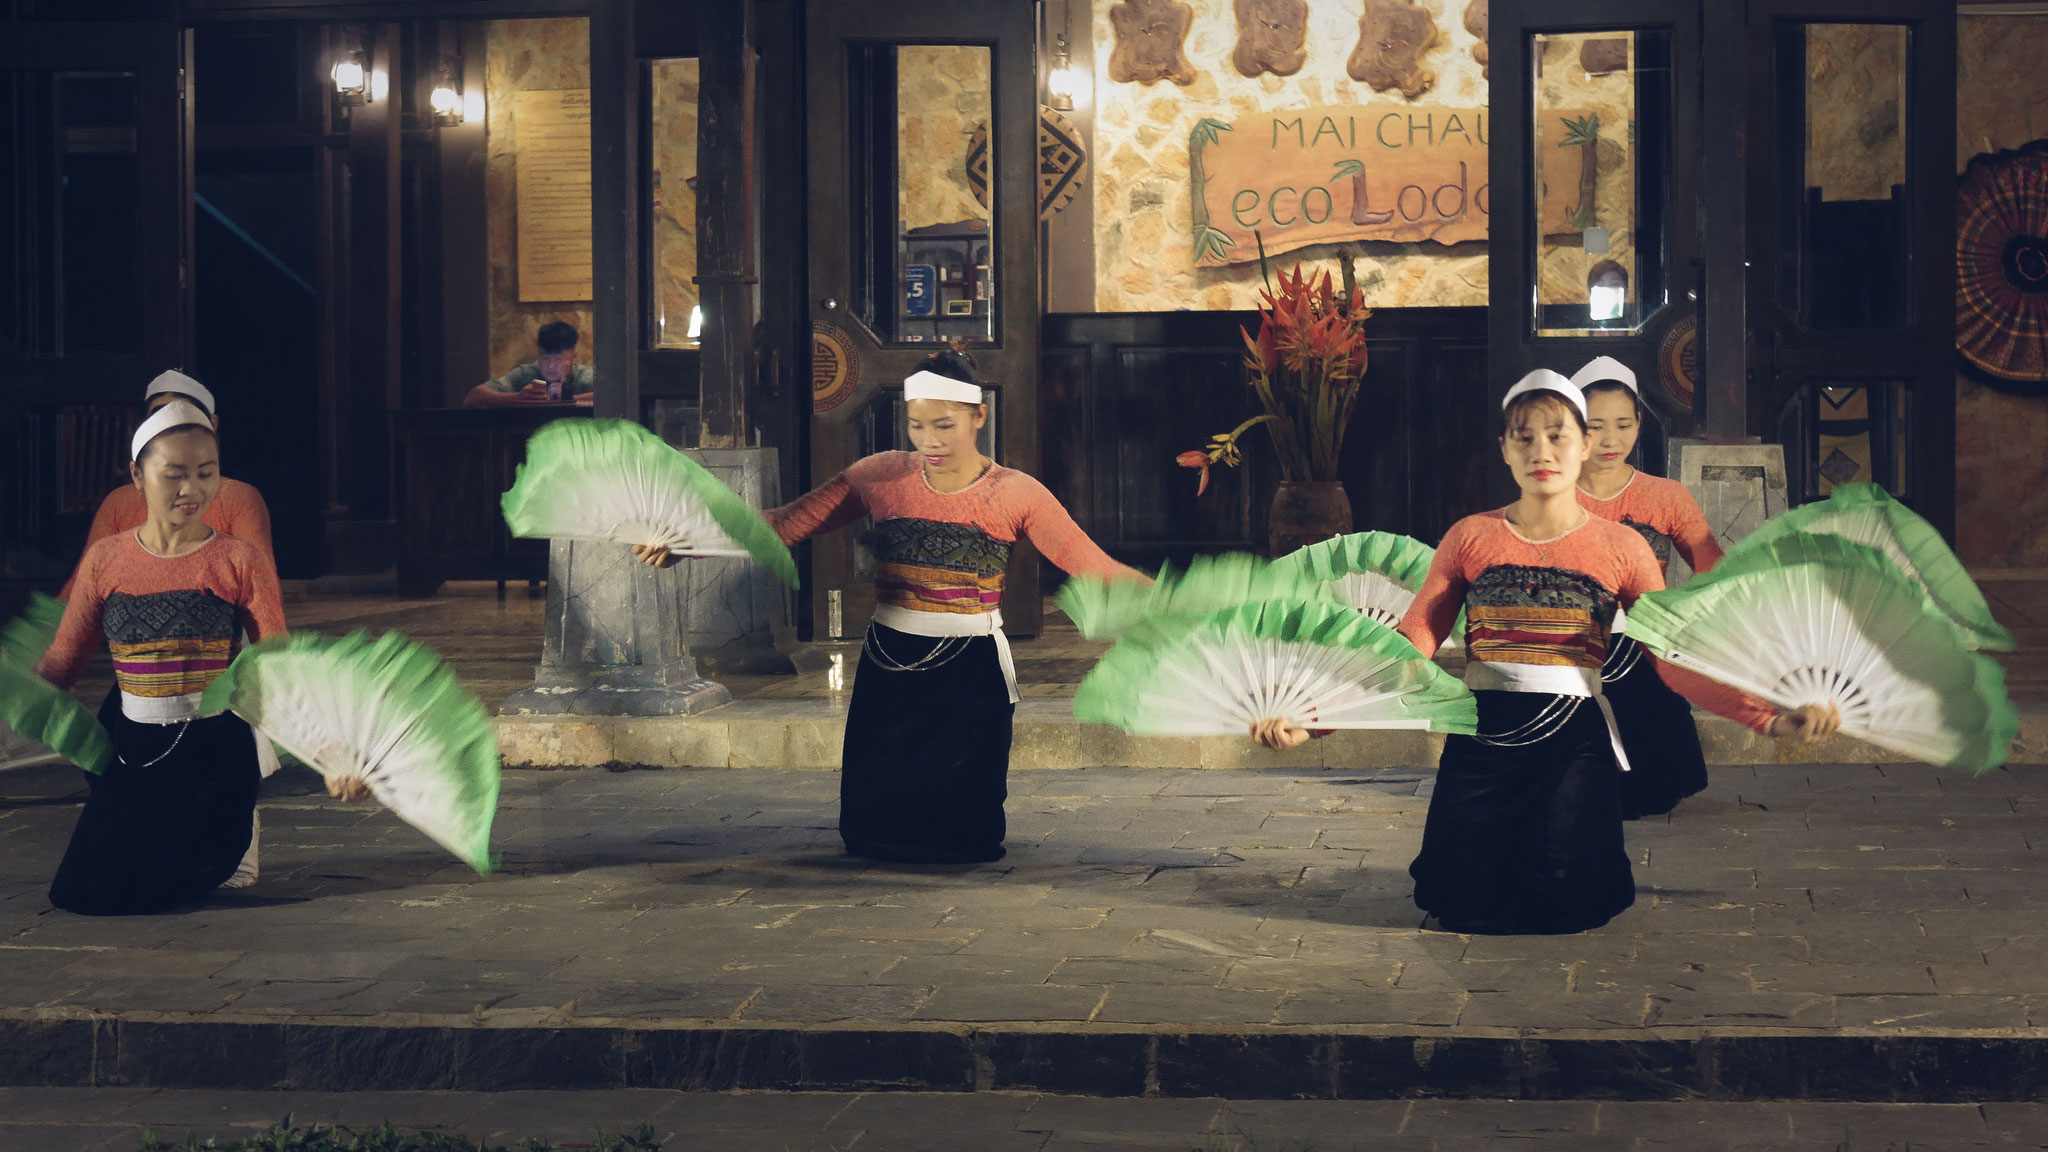 Mai Chau - Tanzveranstaltung Ecolodge